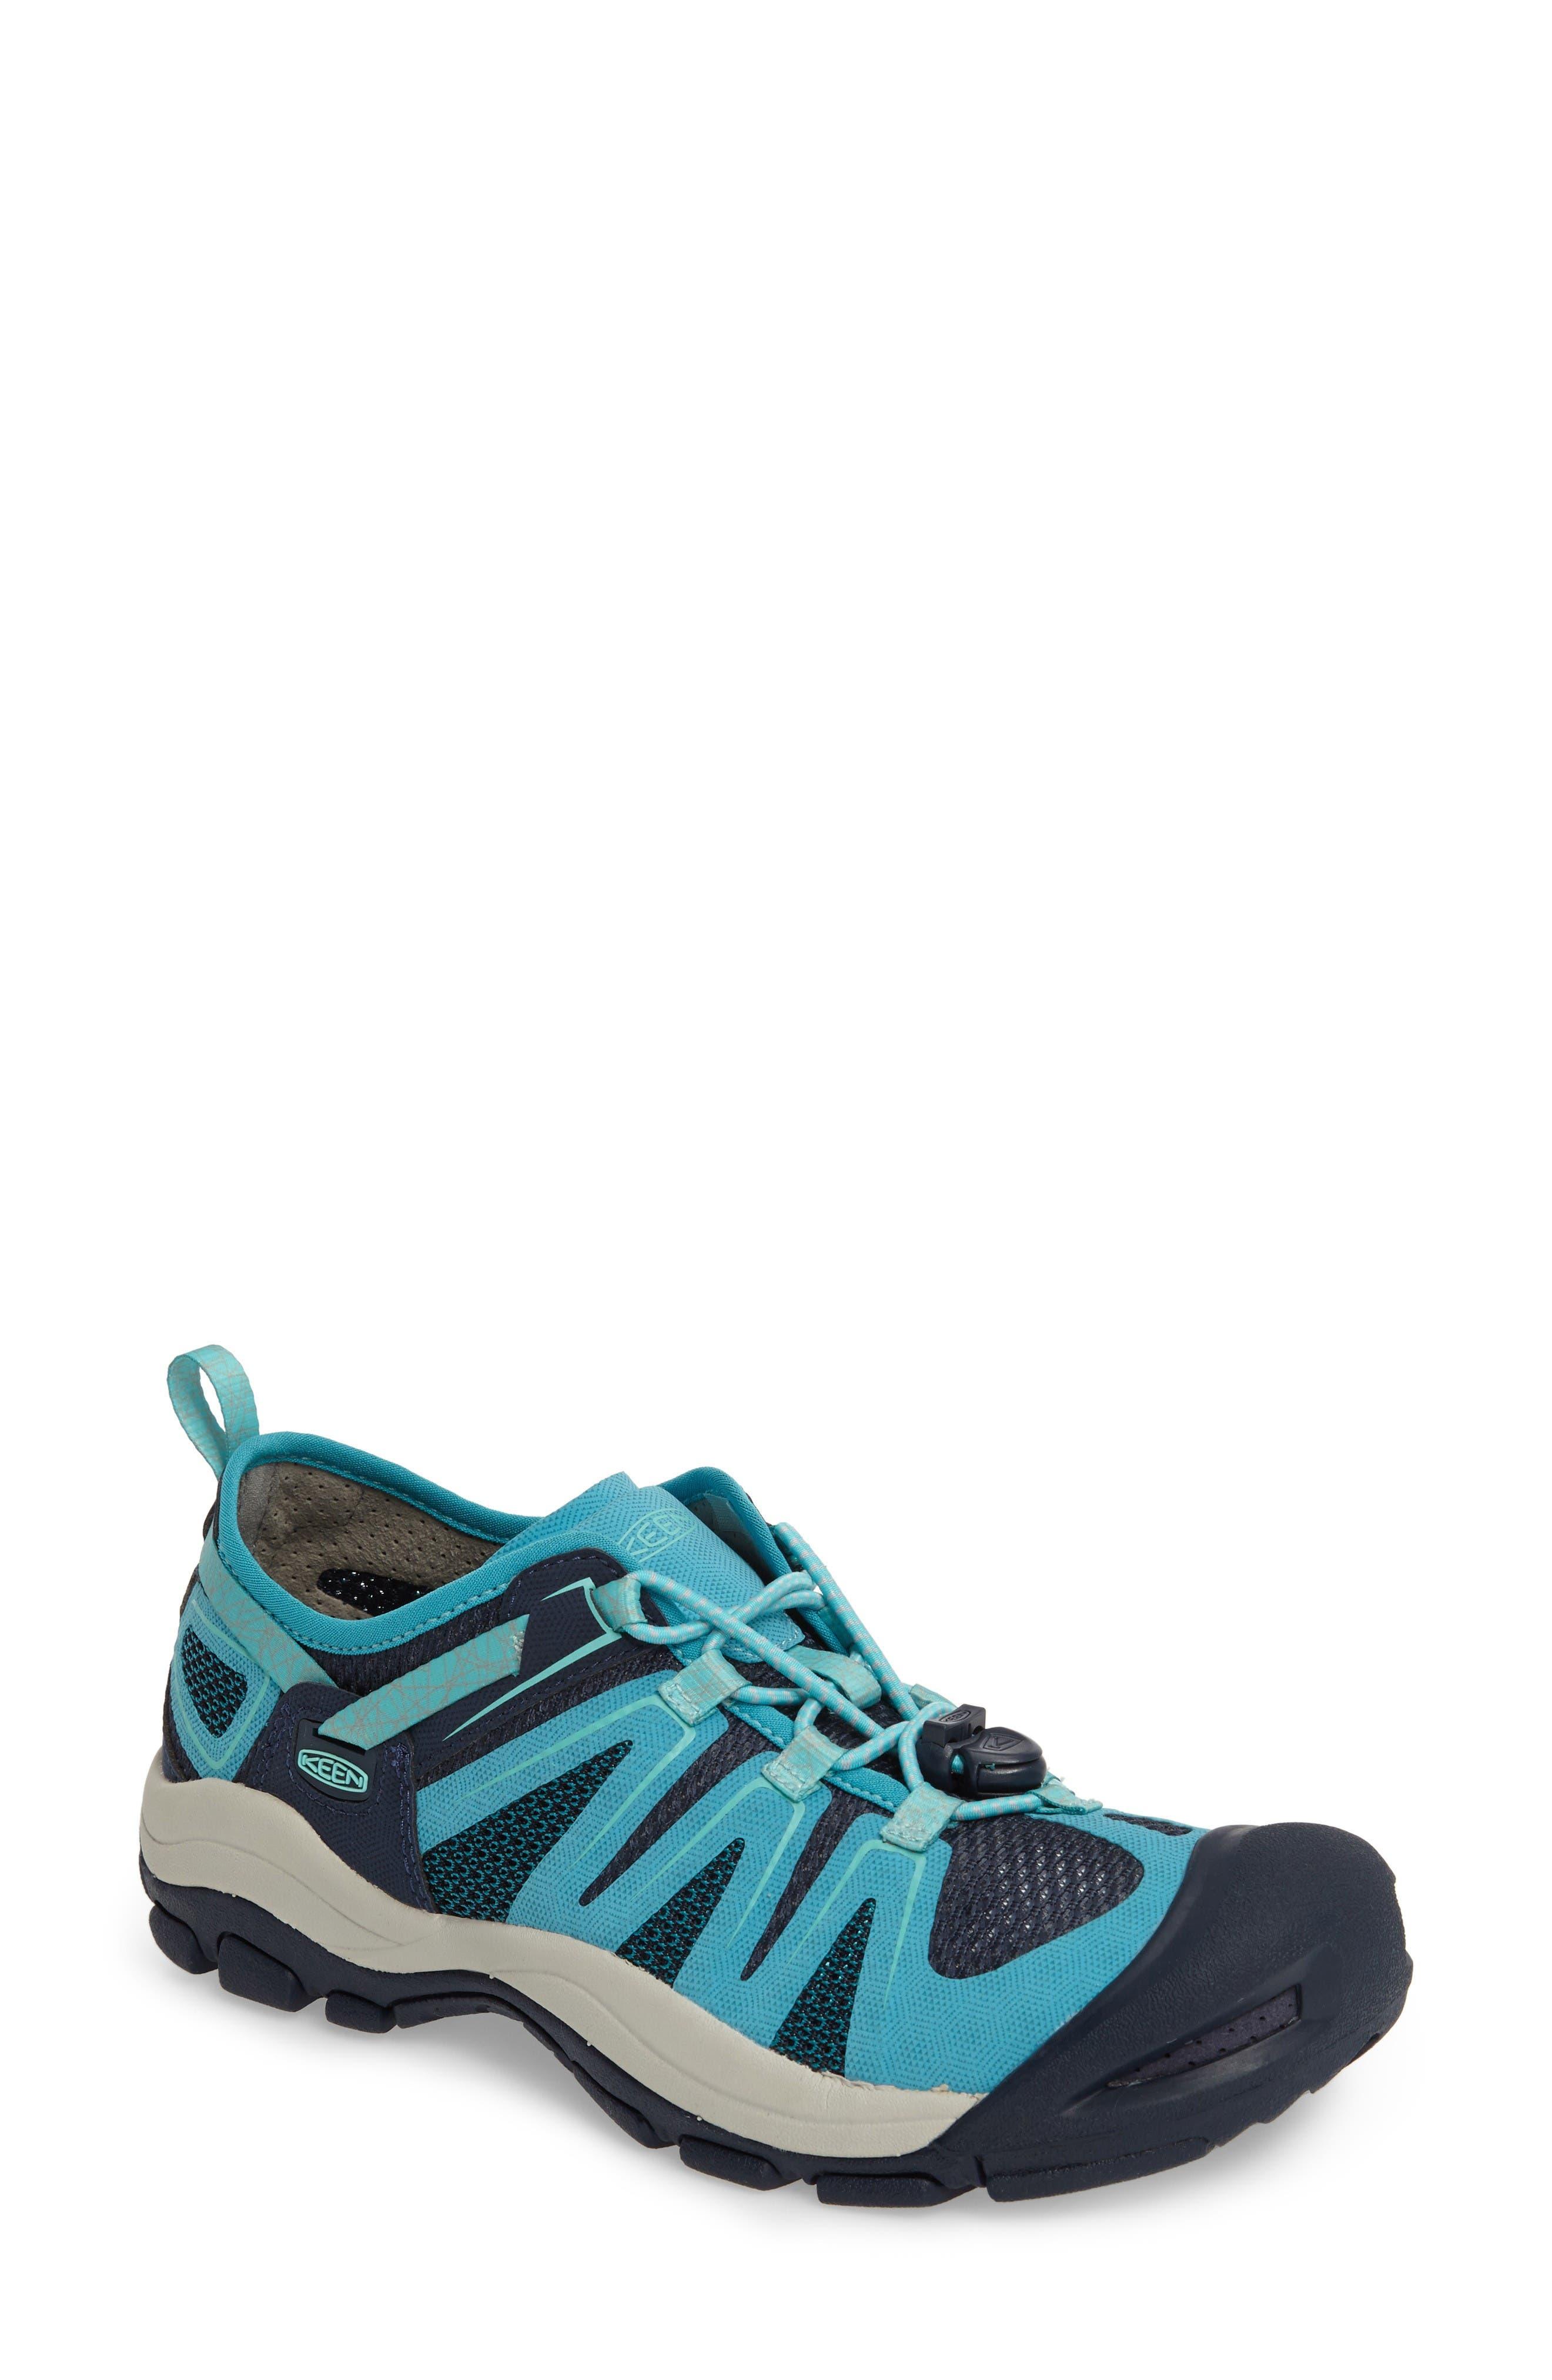 McKenzie II Waterproof Sneaker,                             Main thumbnail 1, color,                             Dress Blues/ Algiers Fabric